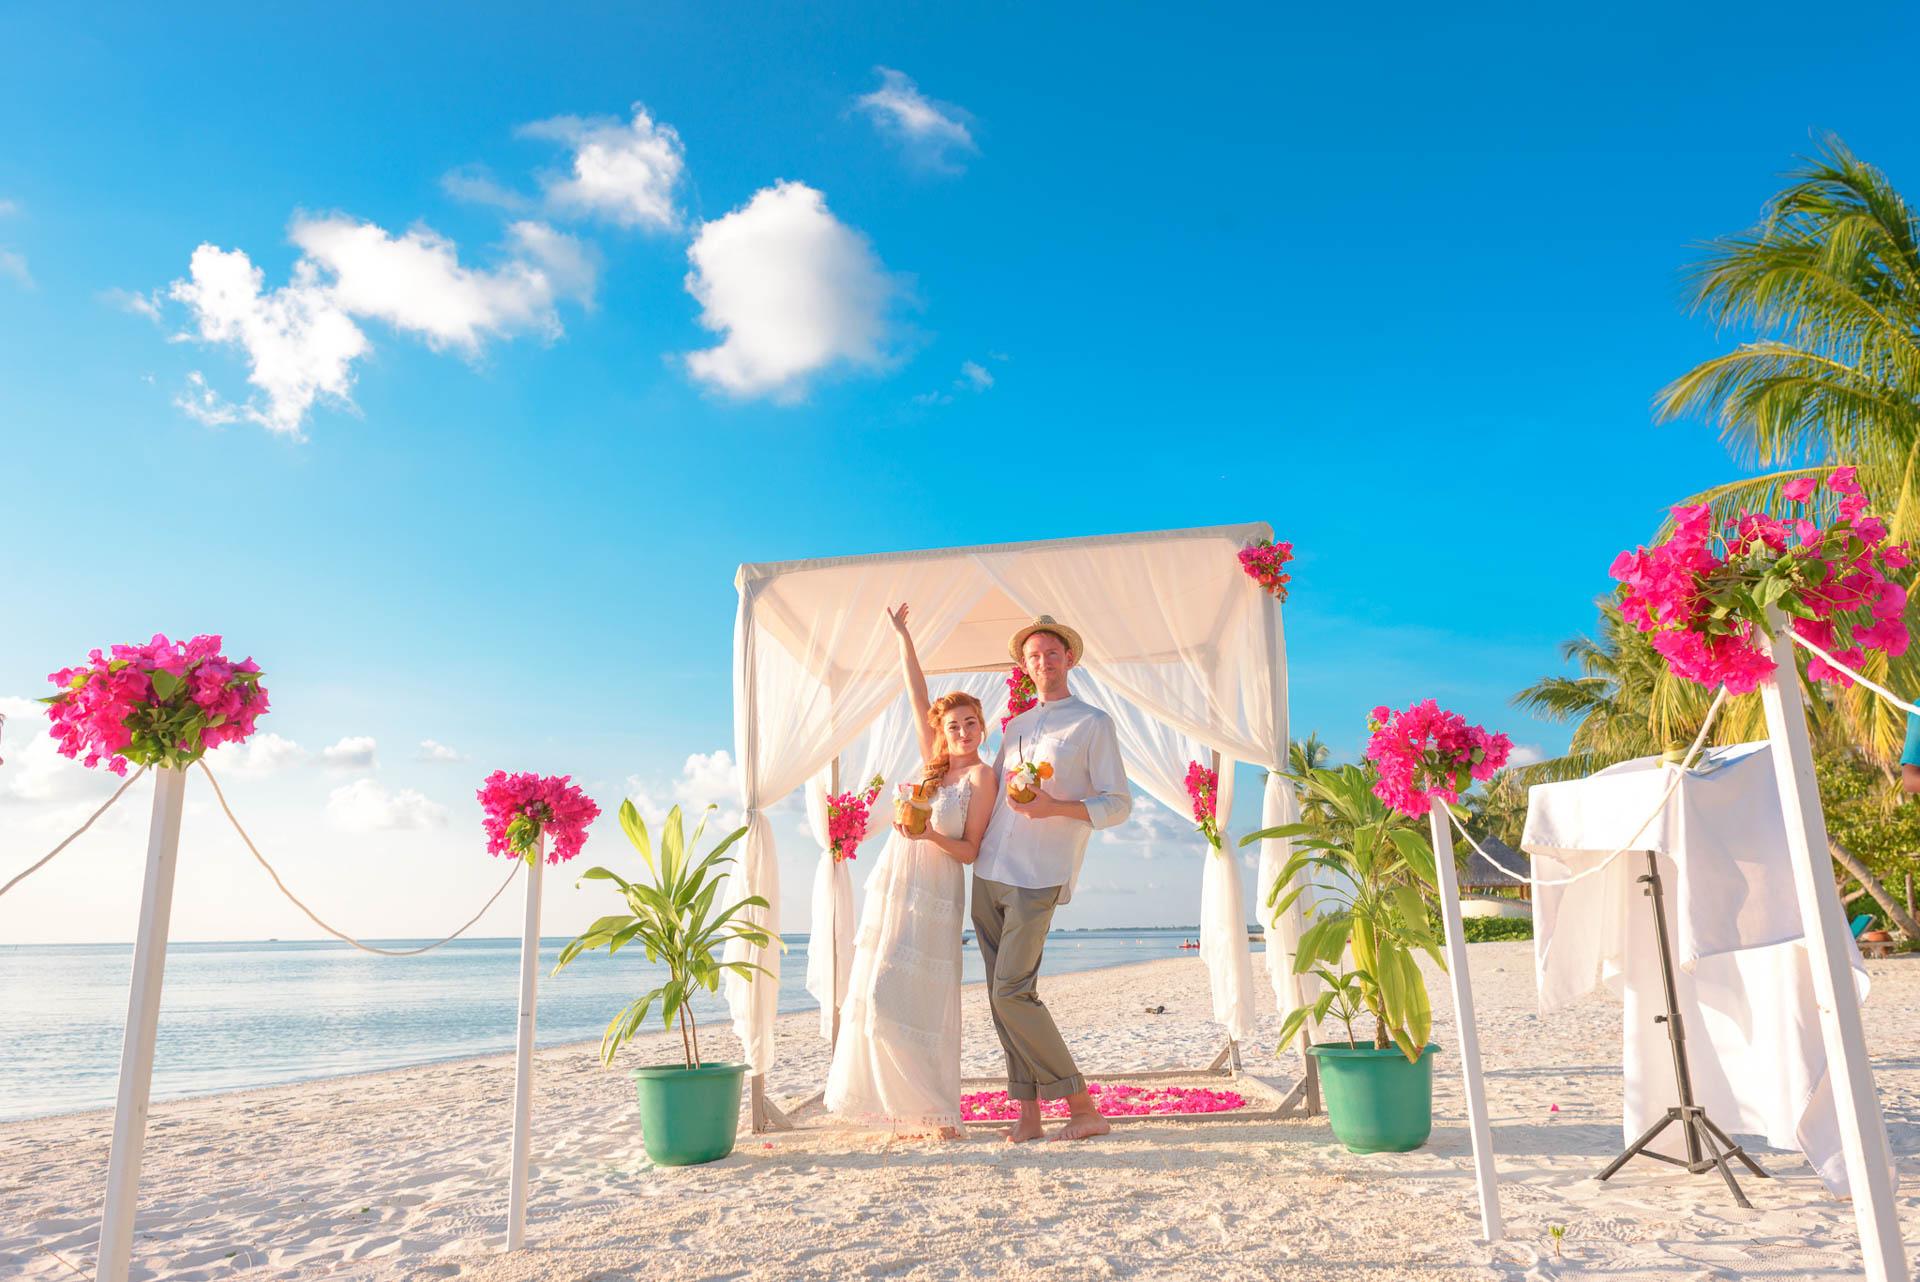 Heike Michaels Beach Wedding in Maldives 12